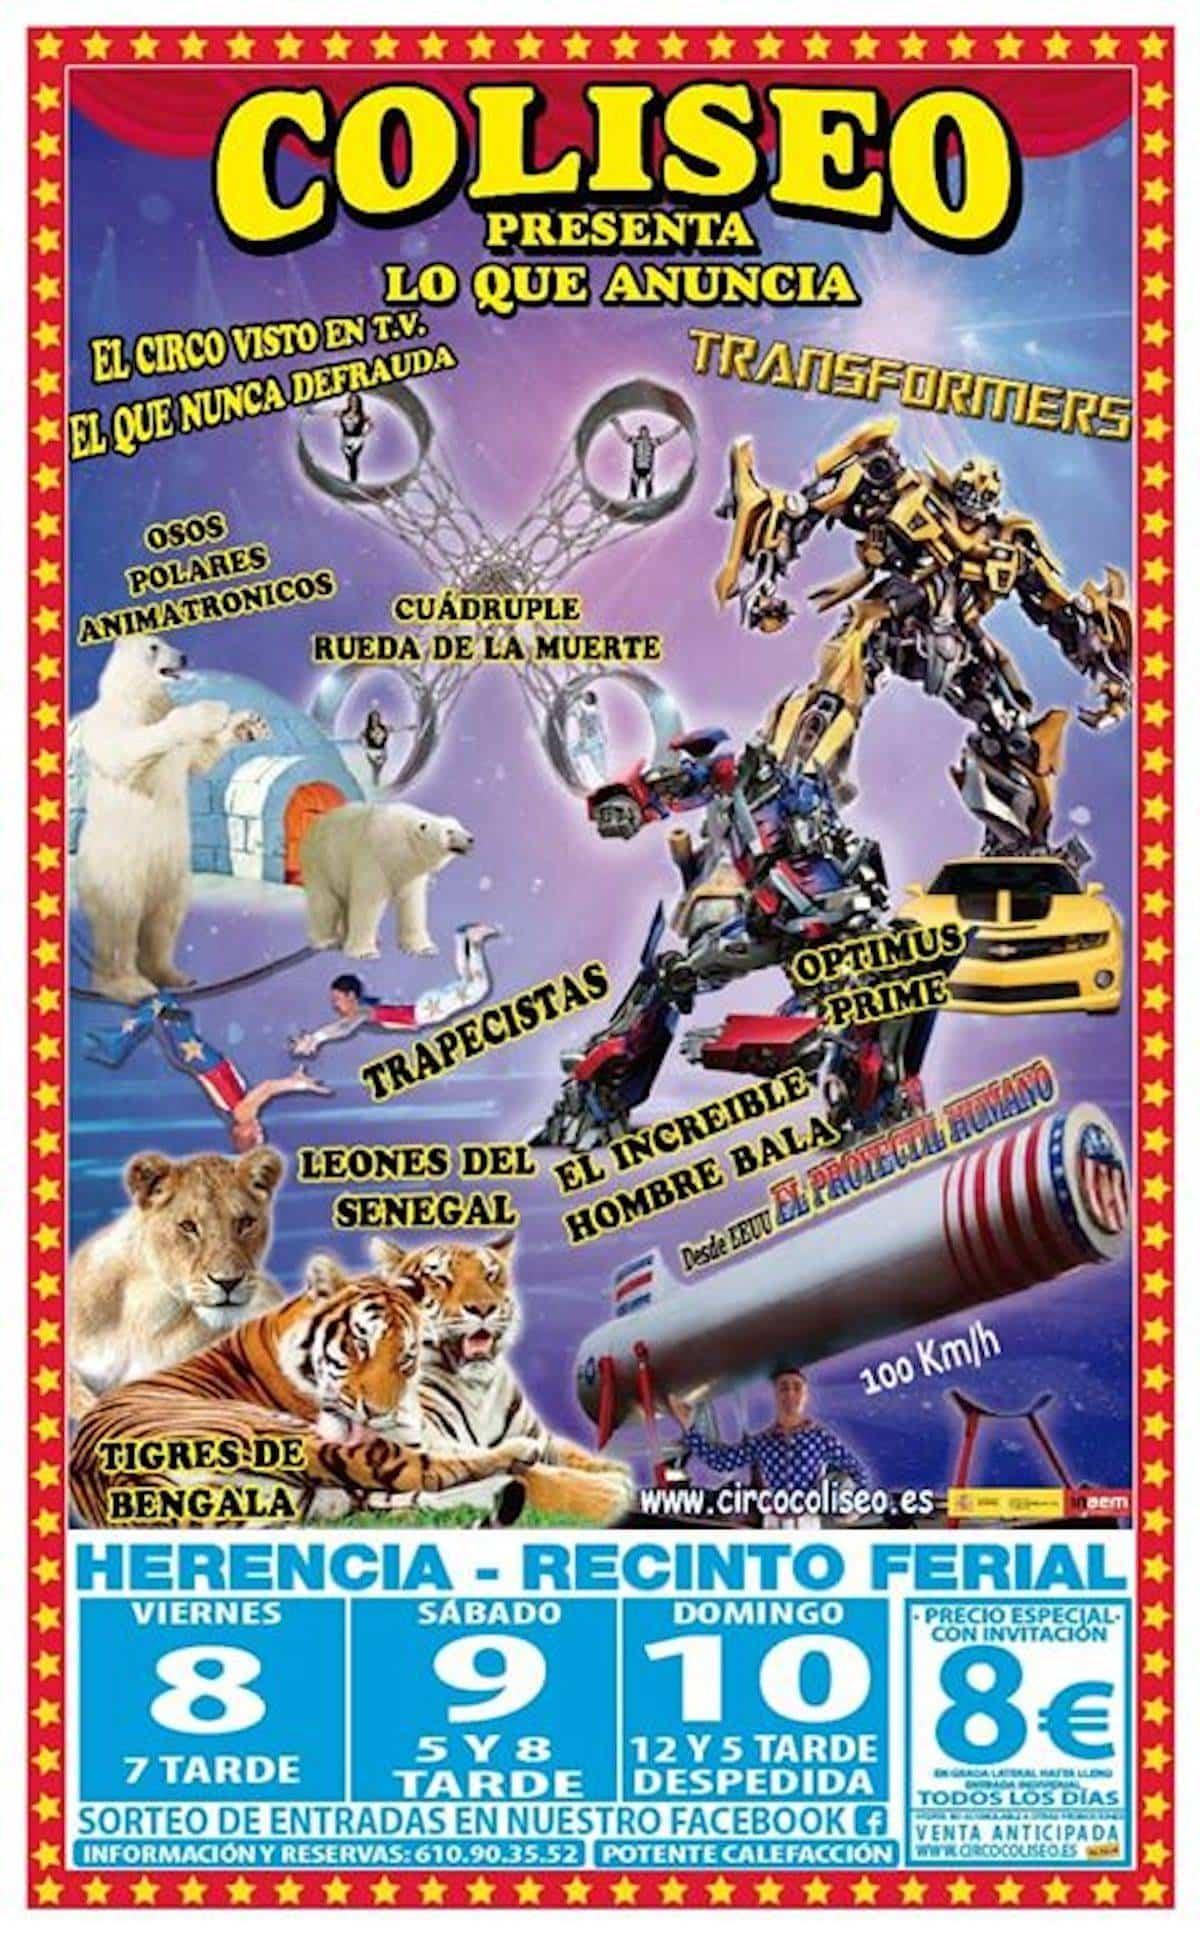 El Circo Coliseo llega a Herencia después de Carnaval 3